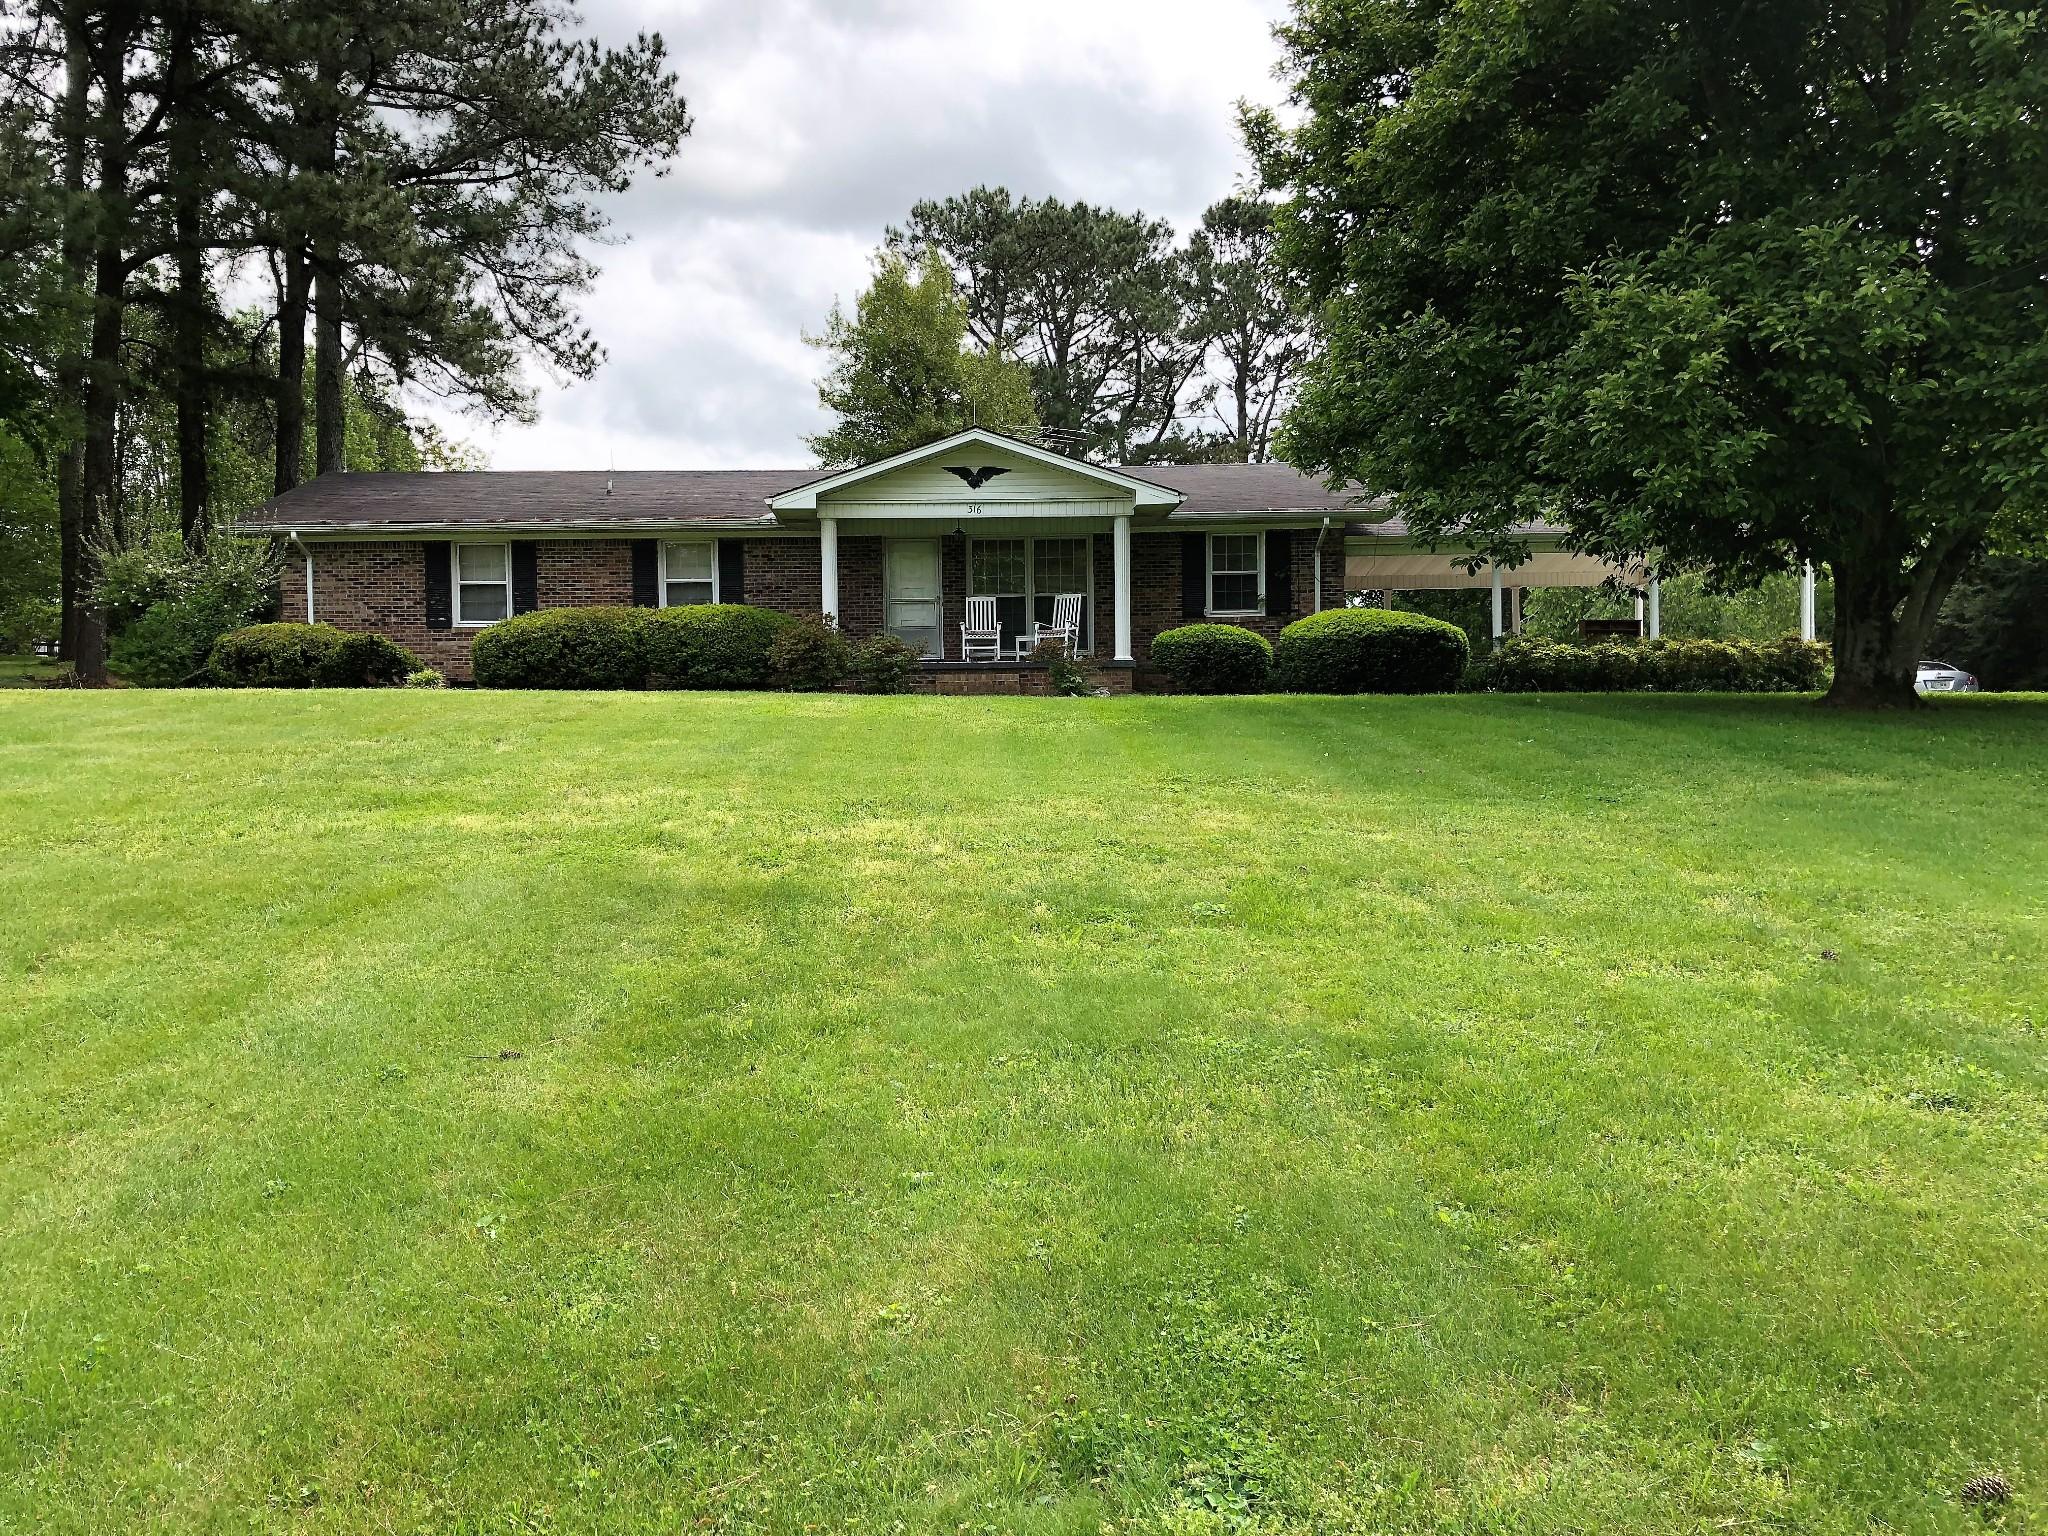 316 N Main St, Cornersville, TN 37047 - Cornersville, TN real estate listing